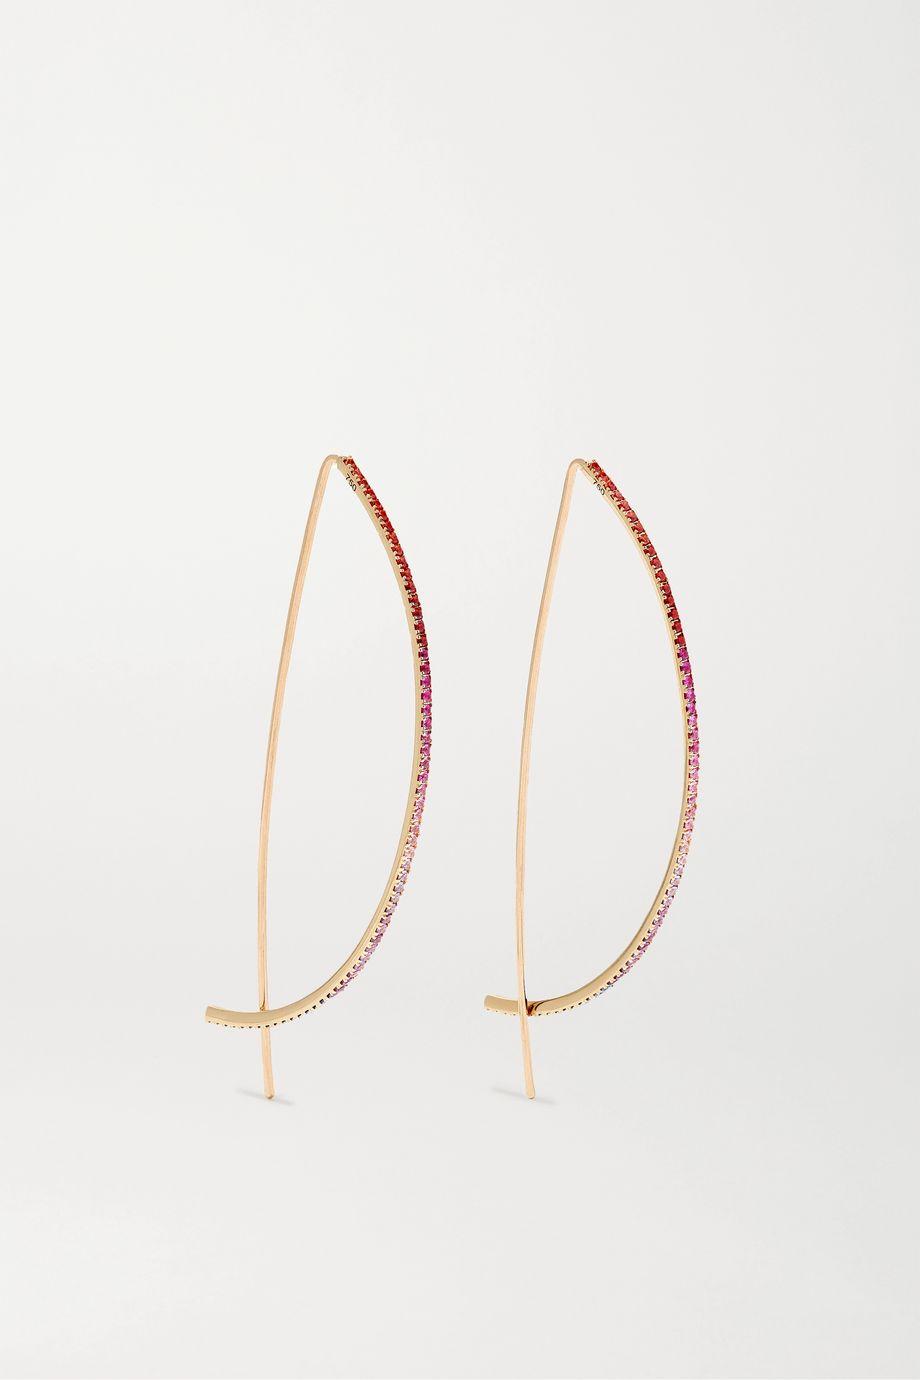 Diane Kordas 18-karat rose gold, sapphire and amethyst earrings